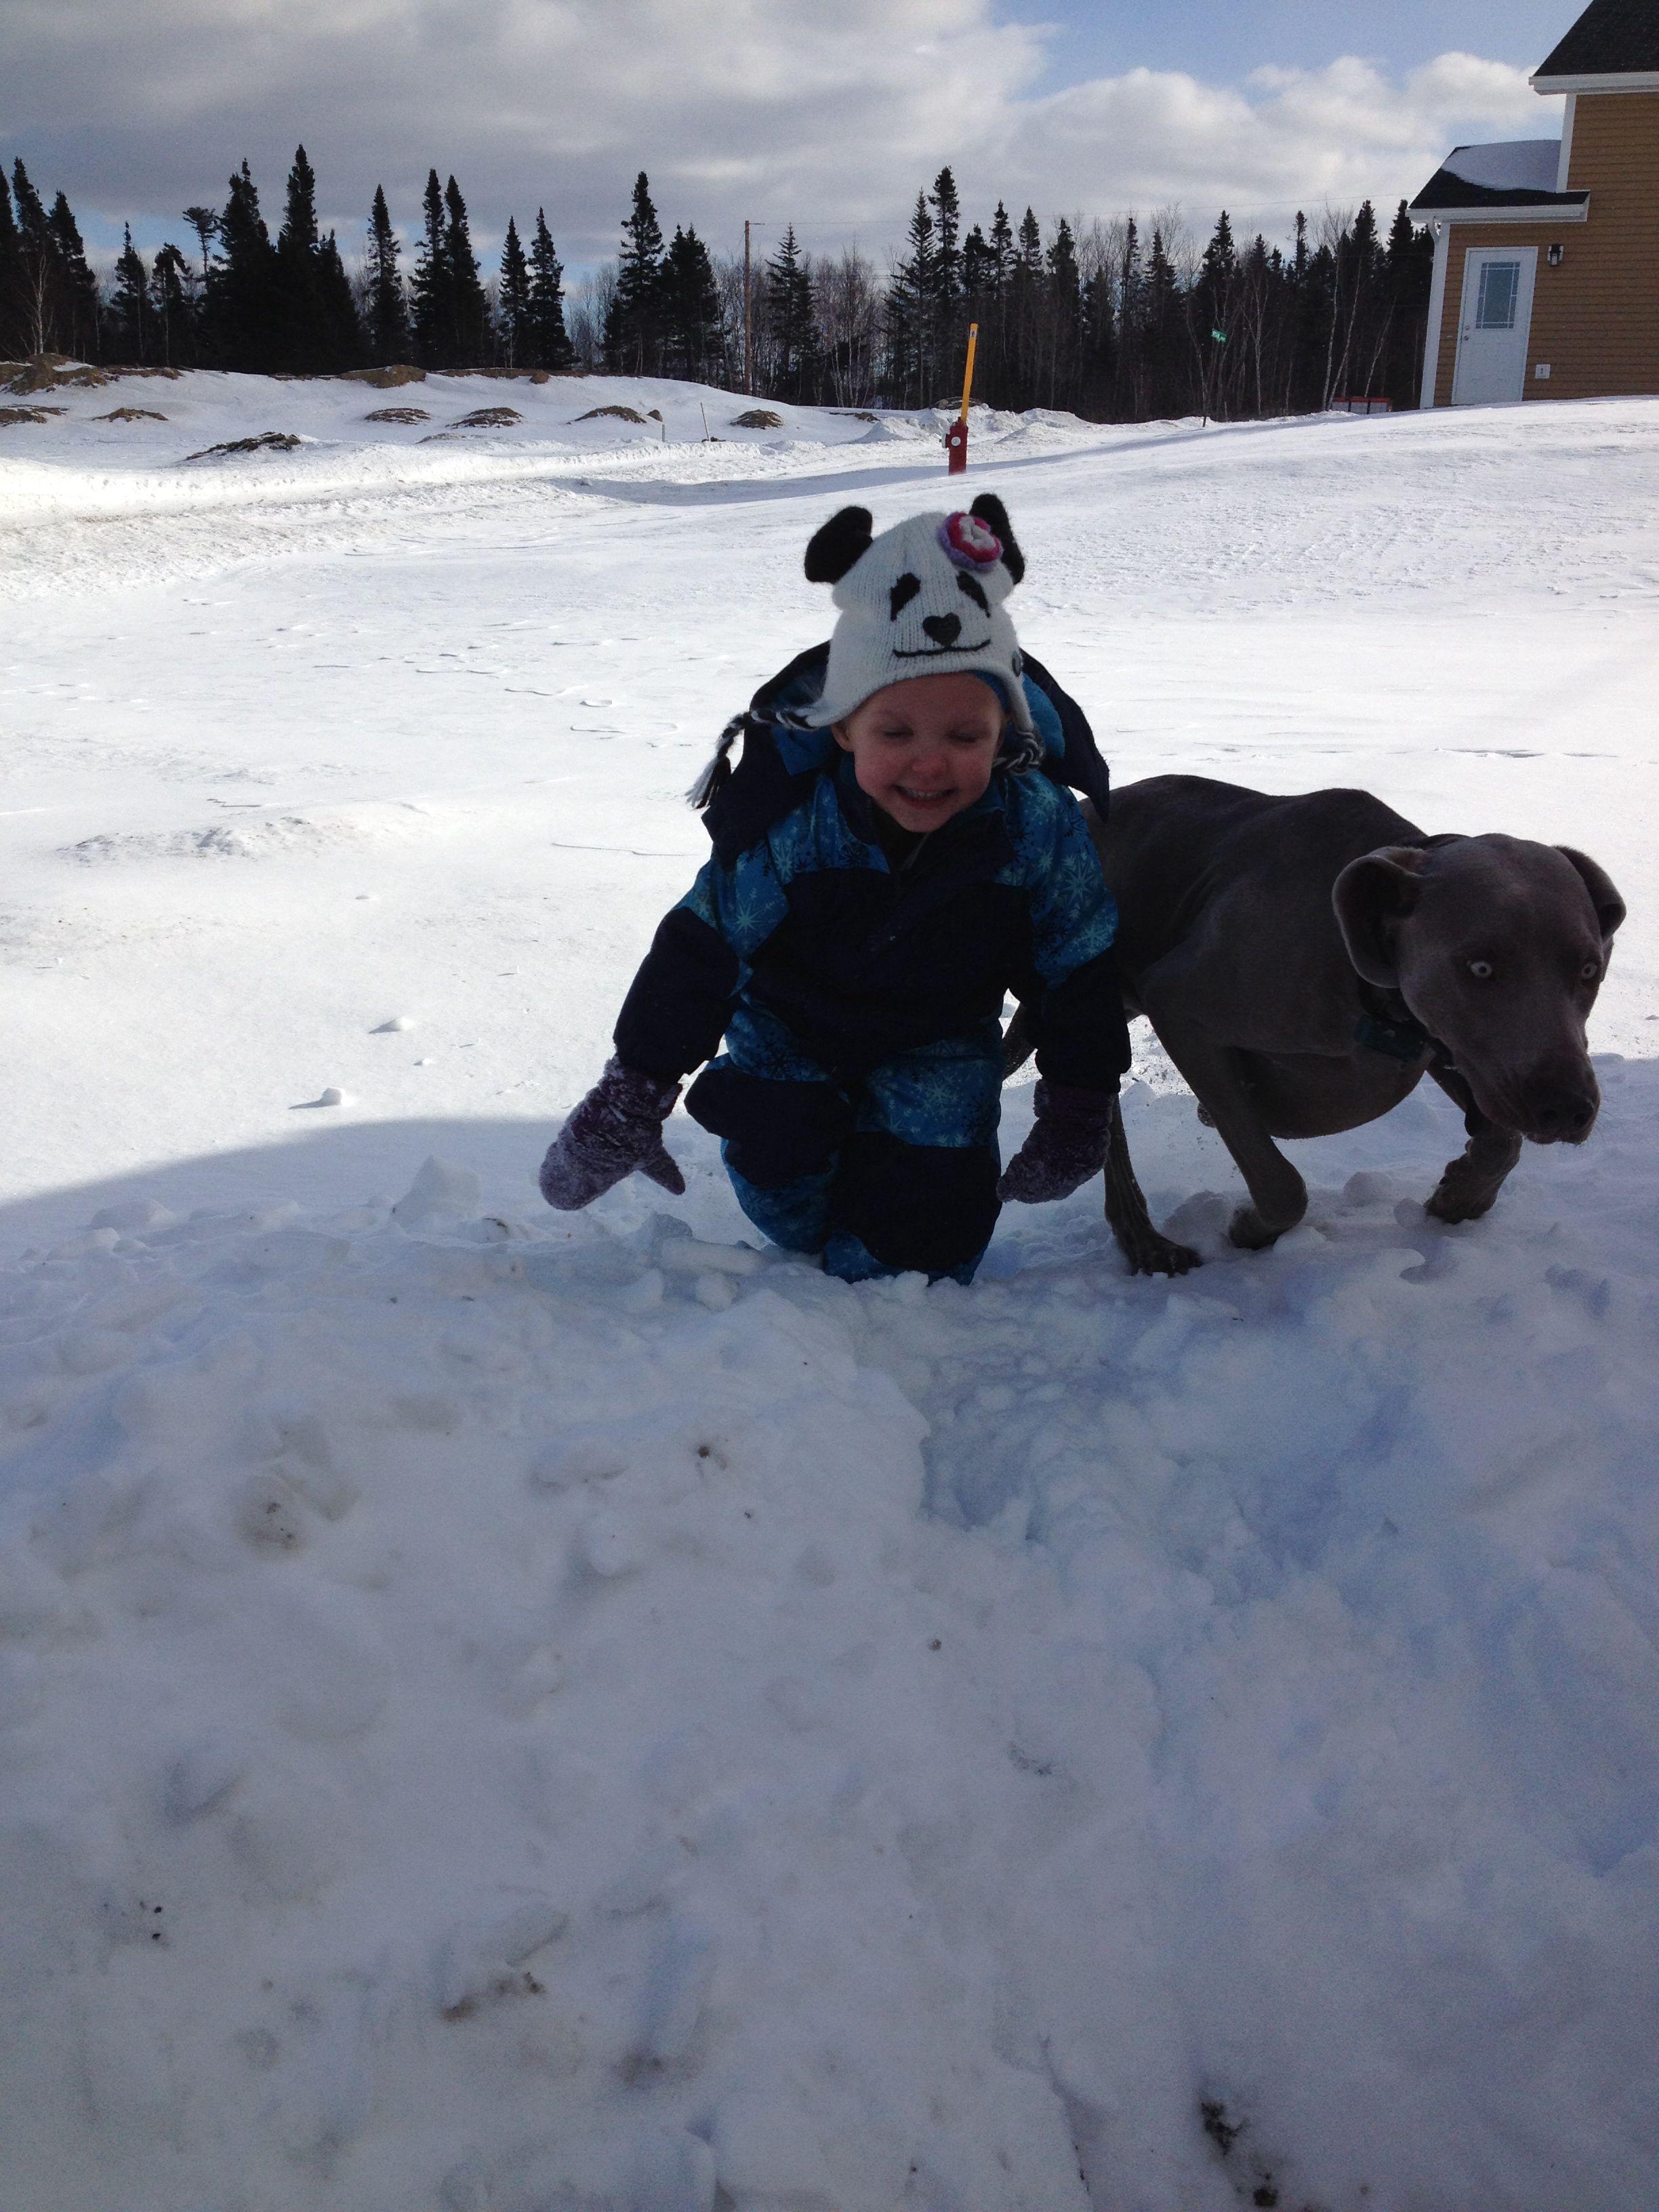 Weimaraner enjoying the snow with little girl